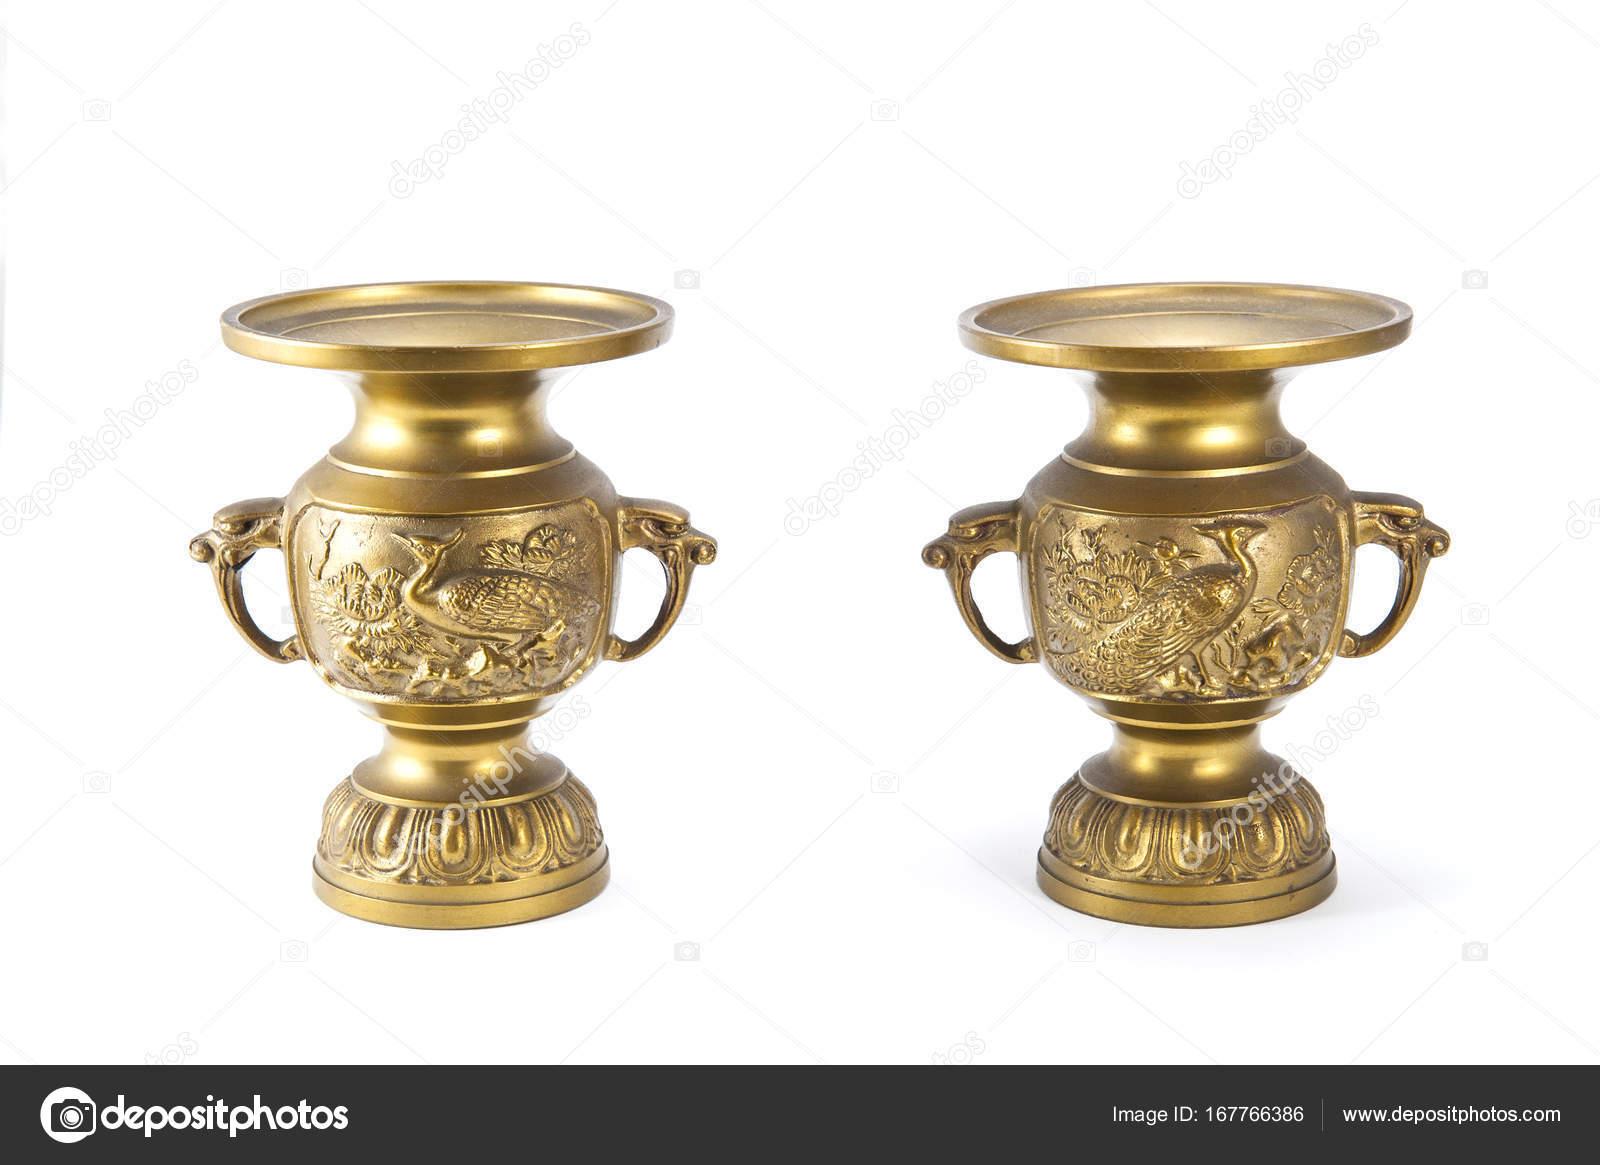 Antique brass vase stock photo zendograph 167766386 antique brass vase on white background photo by zendograph reviewsmspy